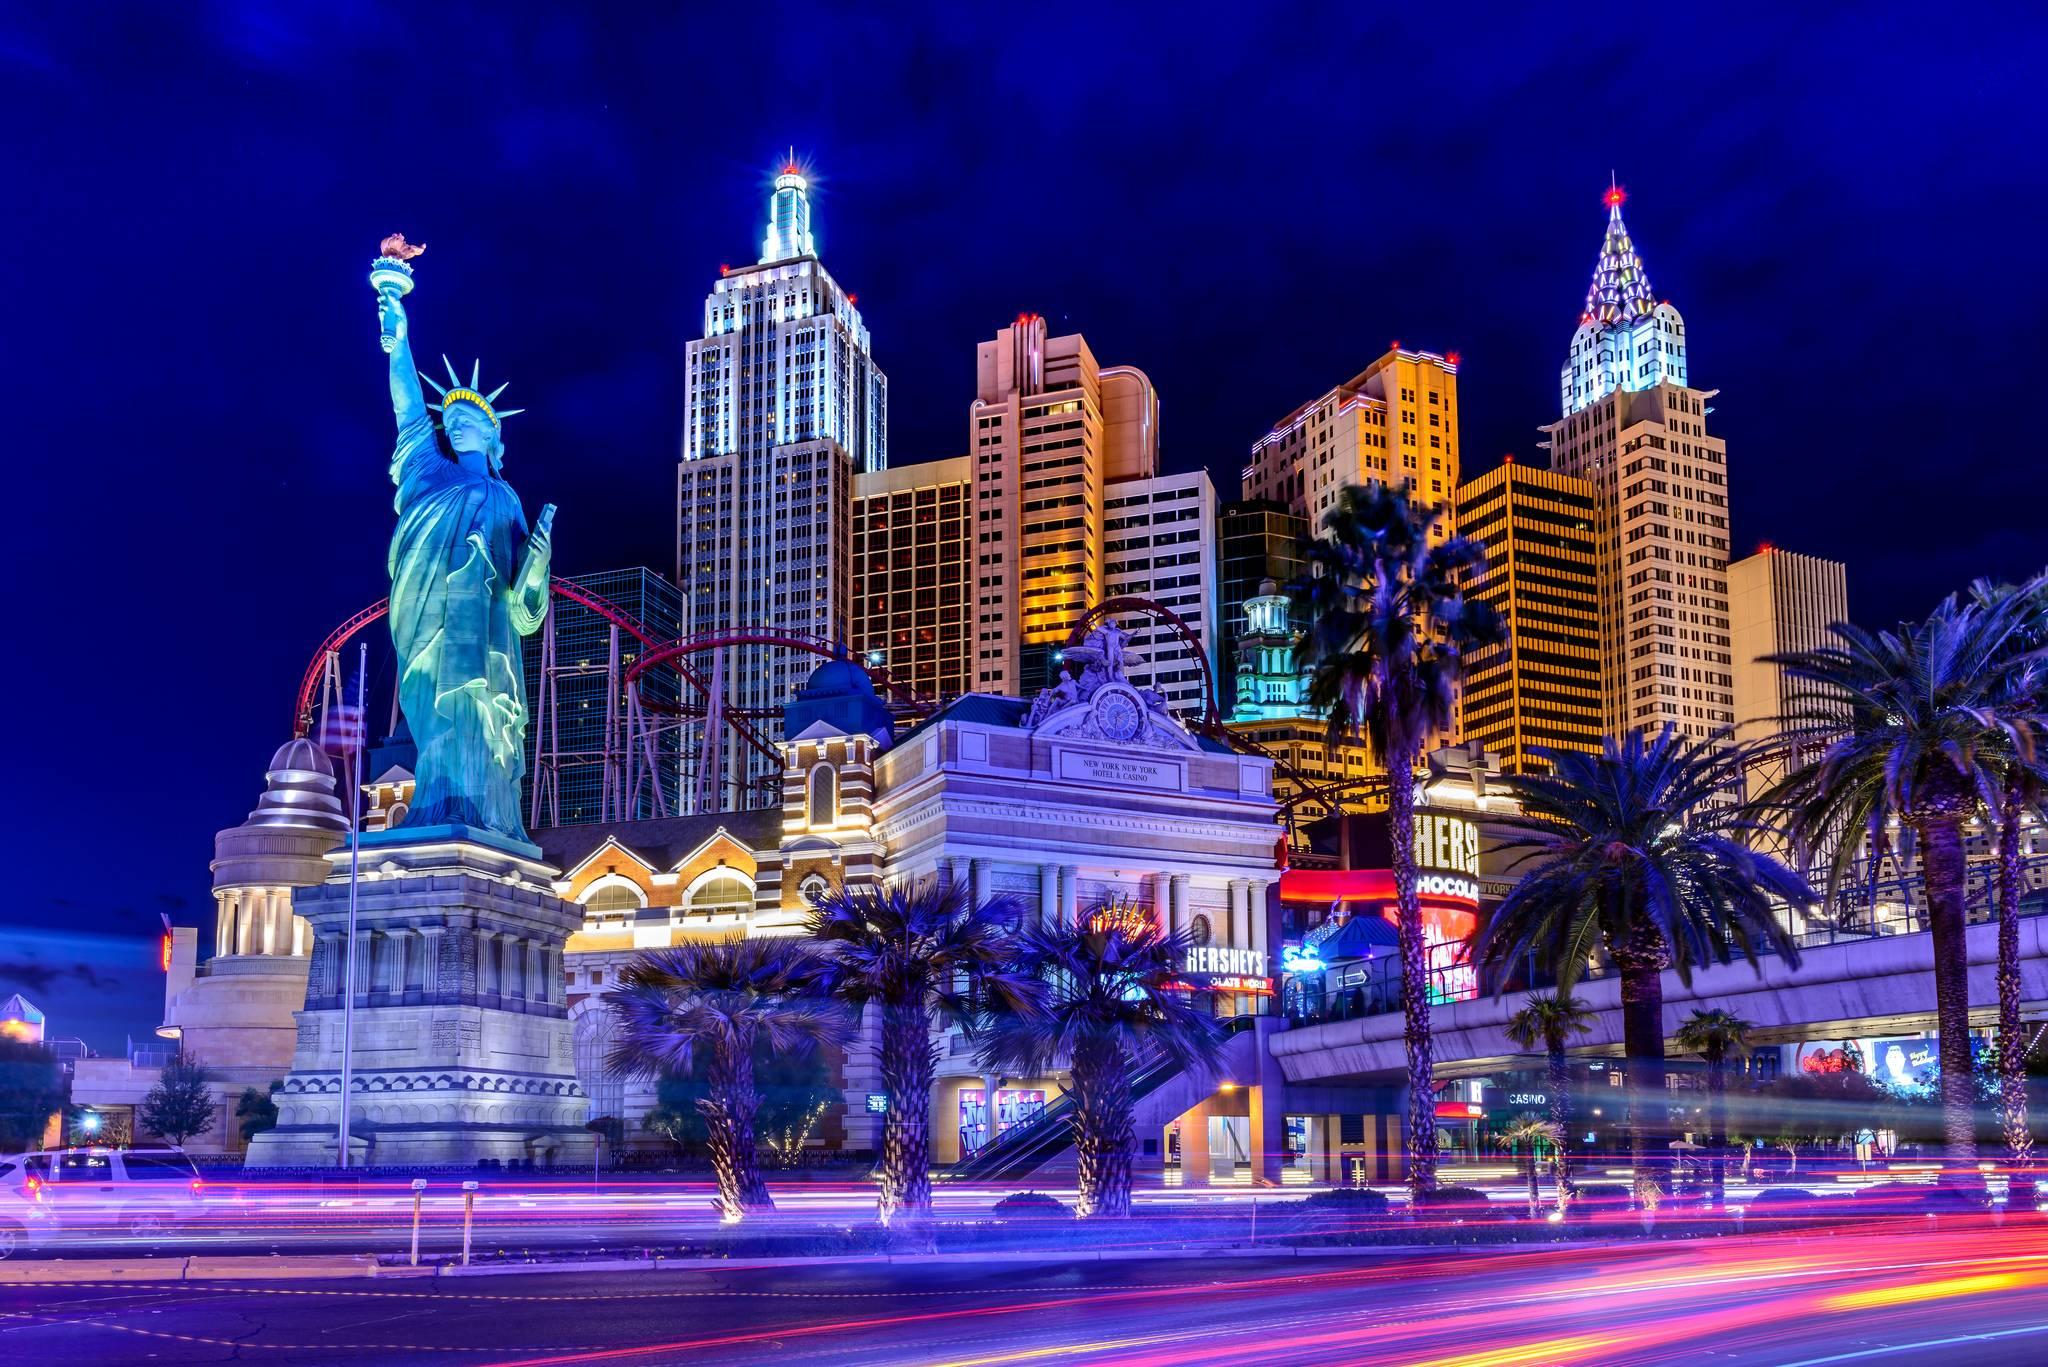 Las Vegas, США, штат Невада